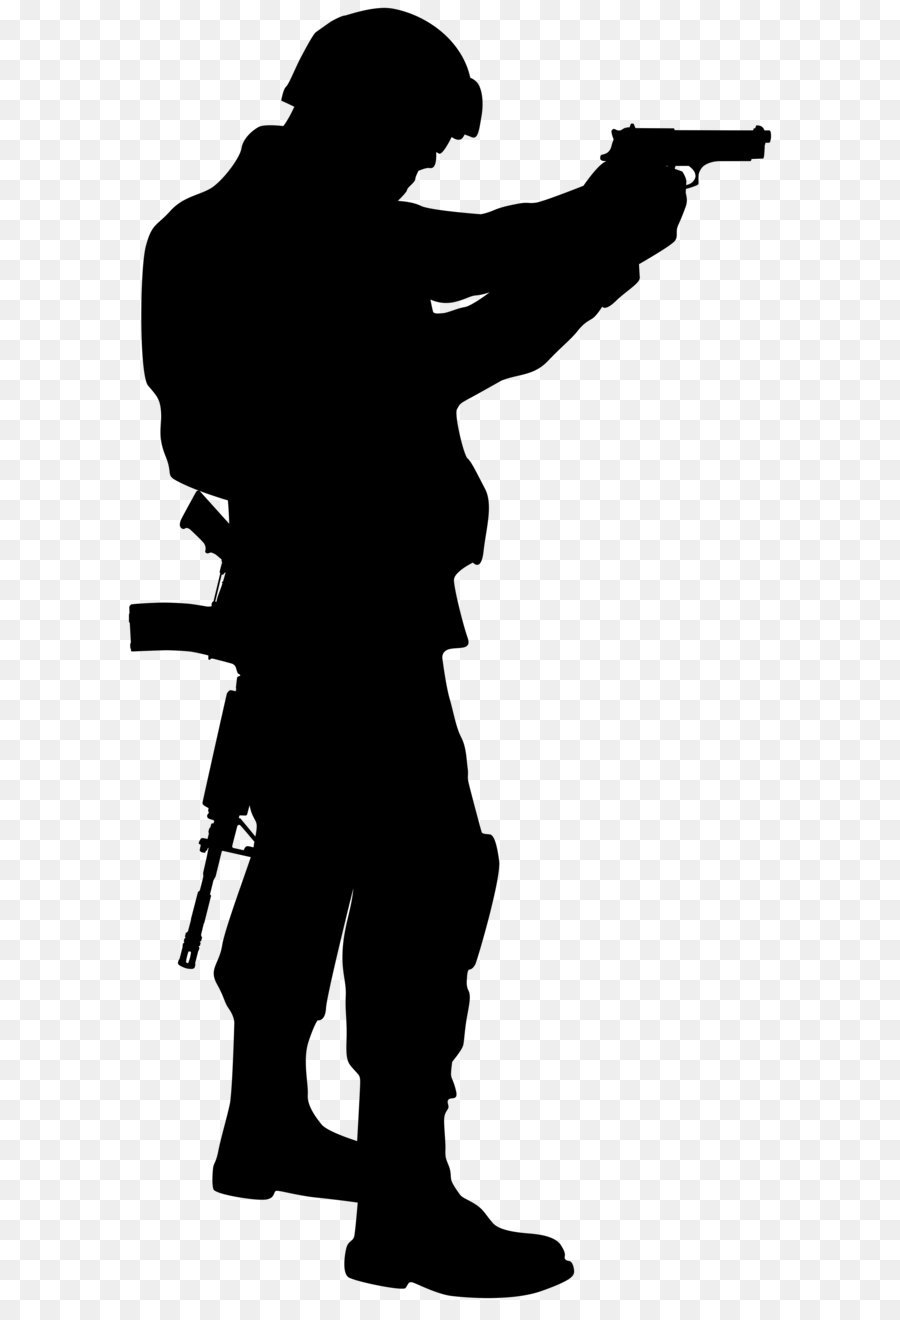 Soldier Silhouette Clip Art Soldier Silhouette Clip Art Image Png